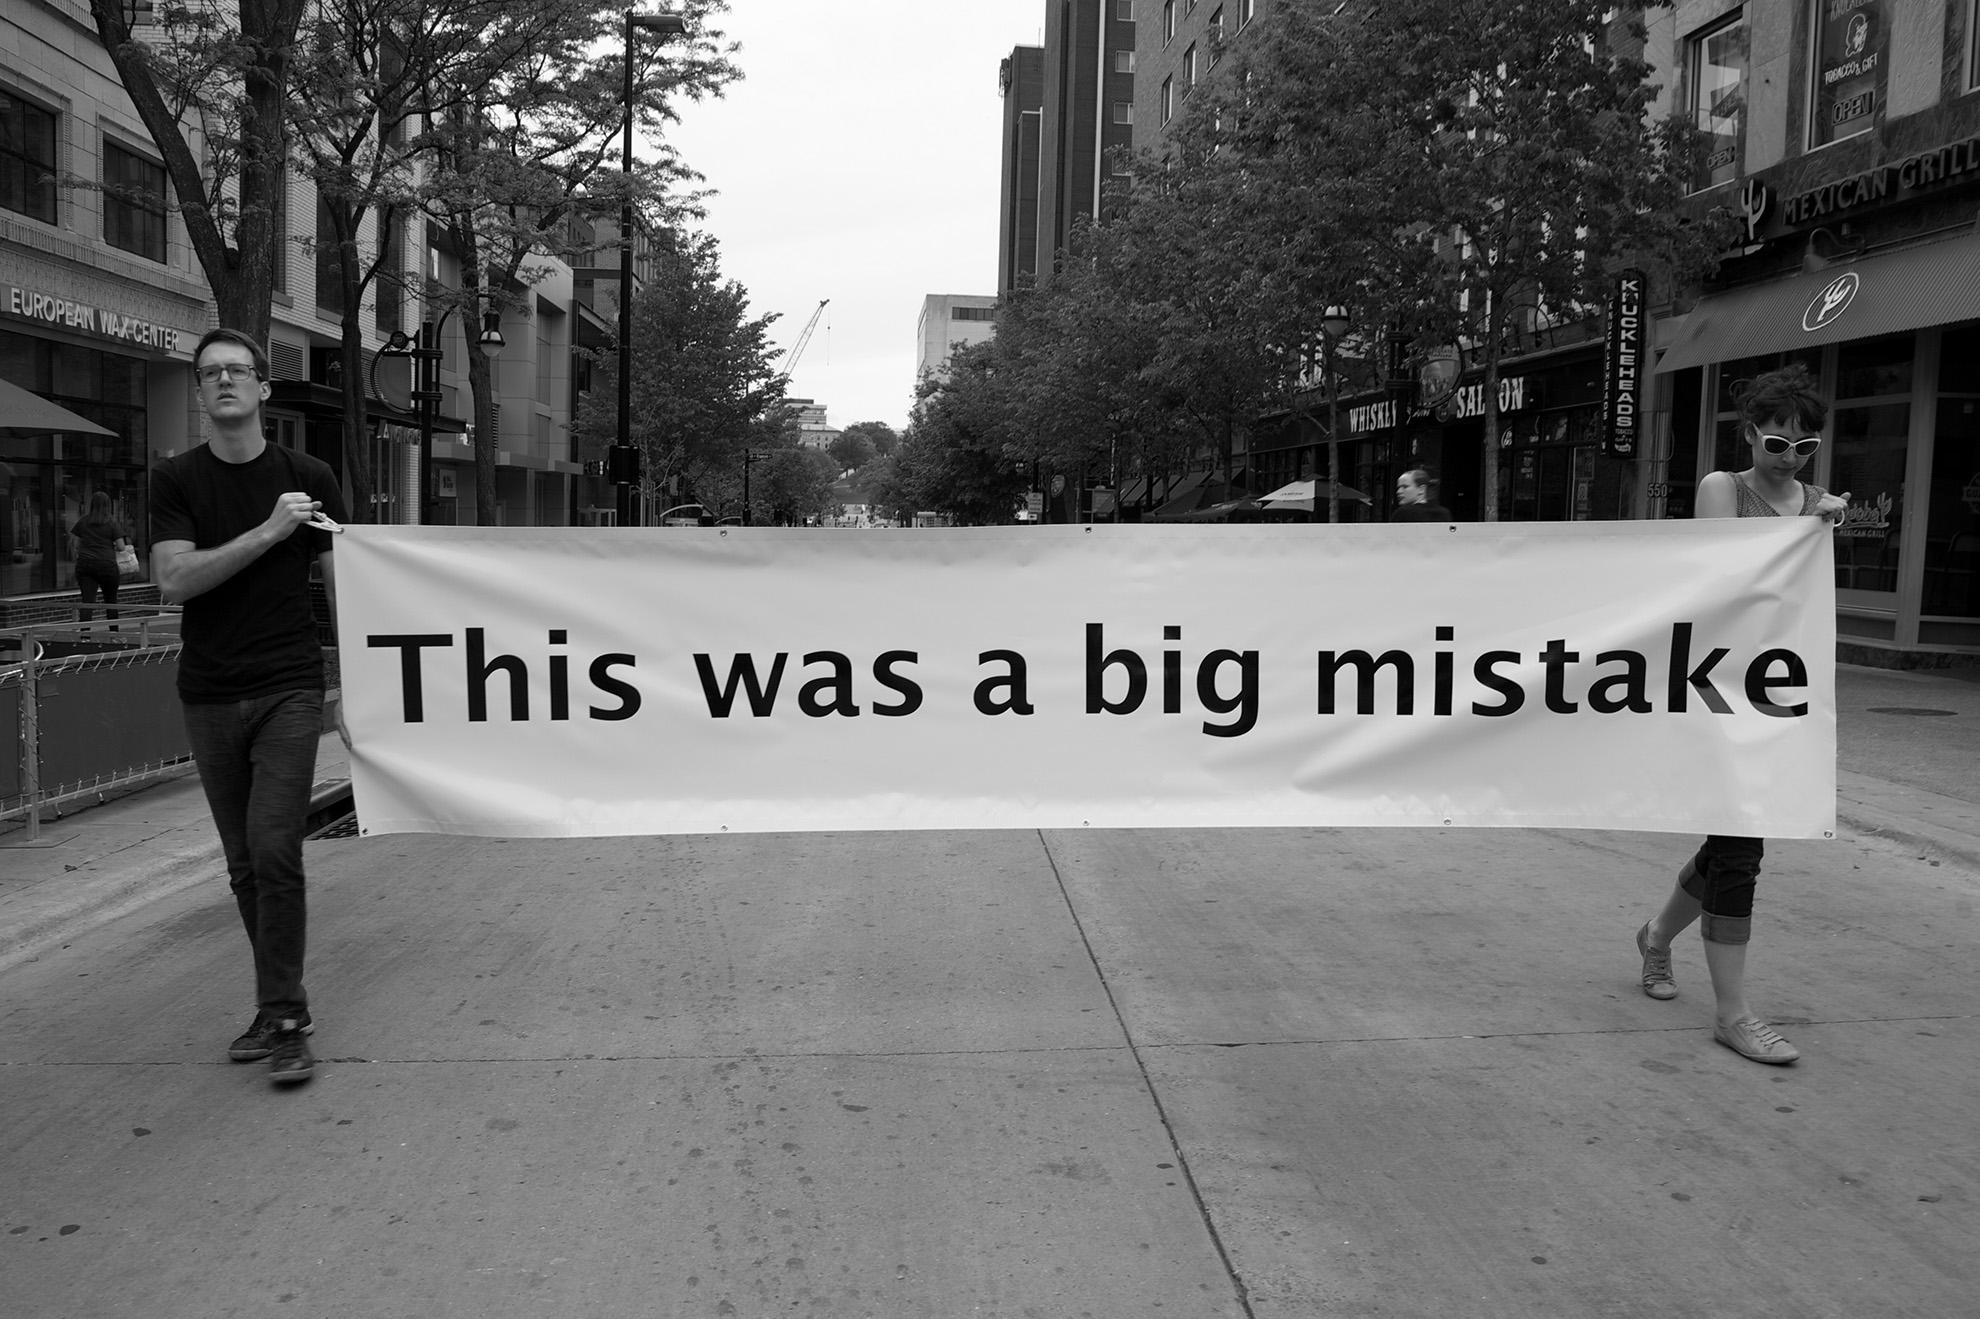 bigmistakeprotest-9.jpg